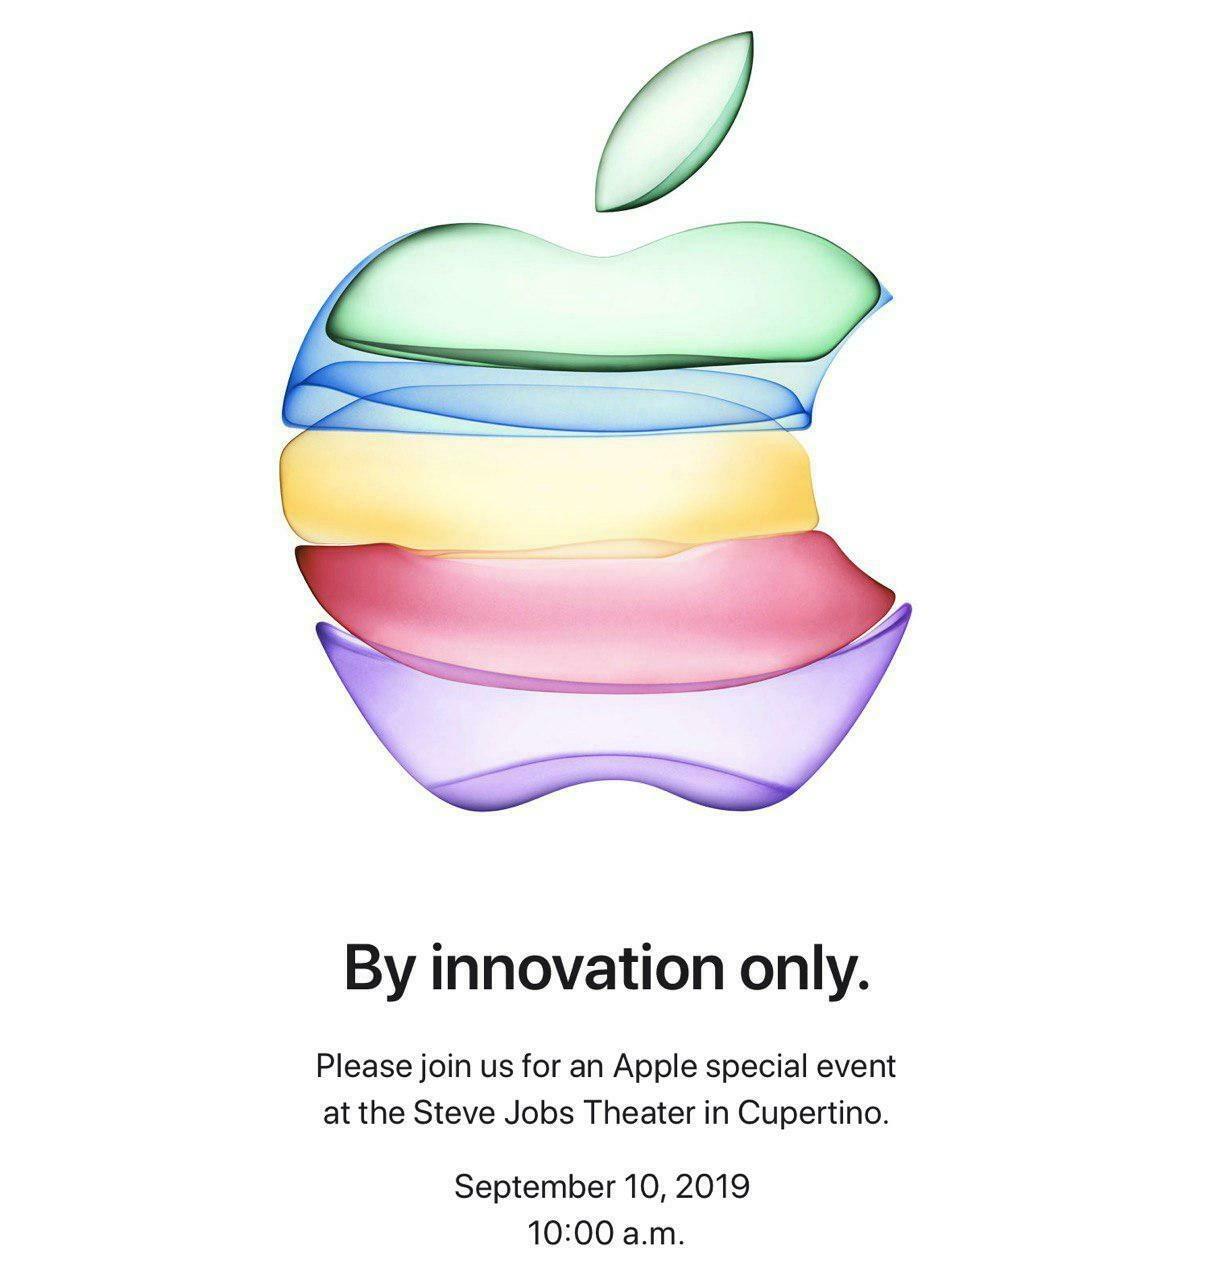 Текстовая трансляция Apple — 10 сентября 2019 года